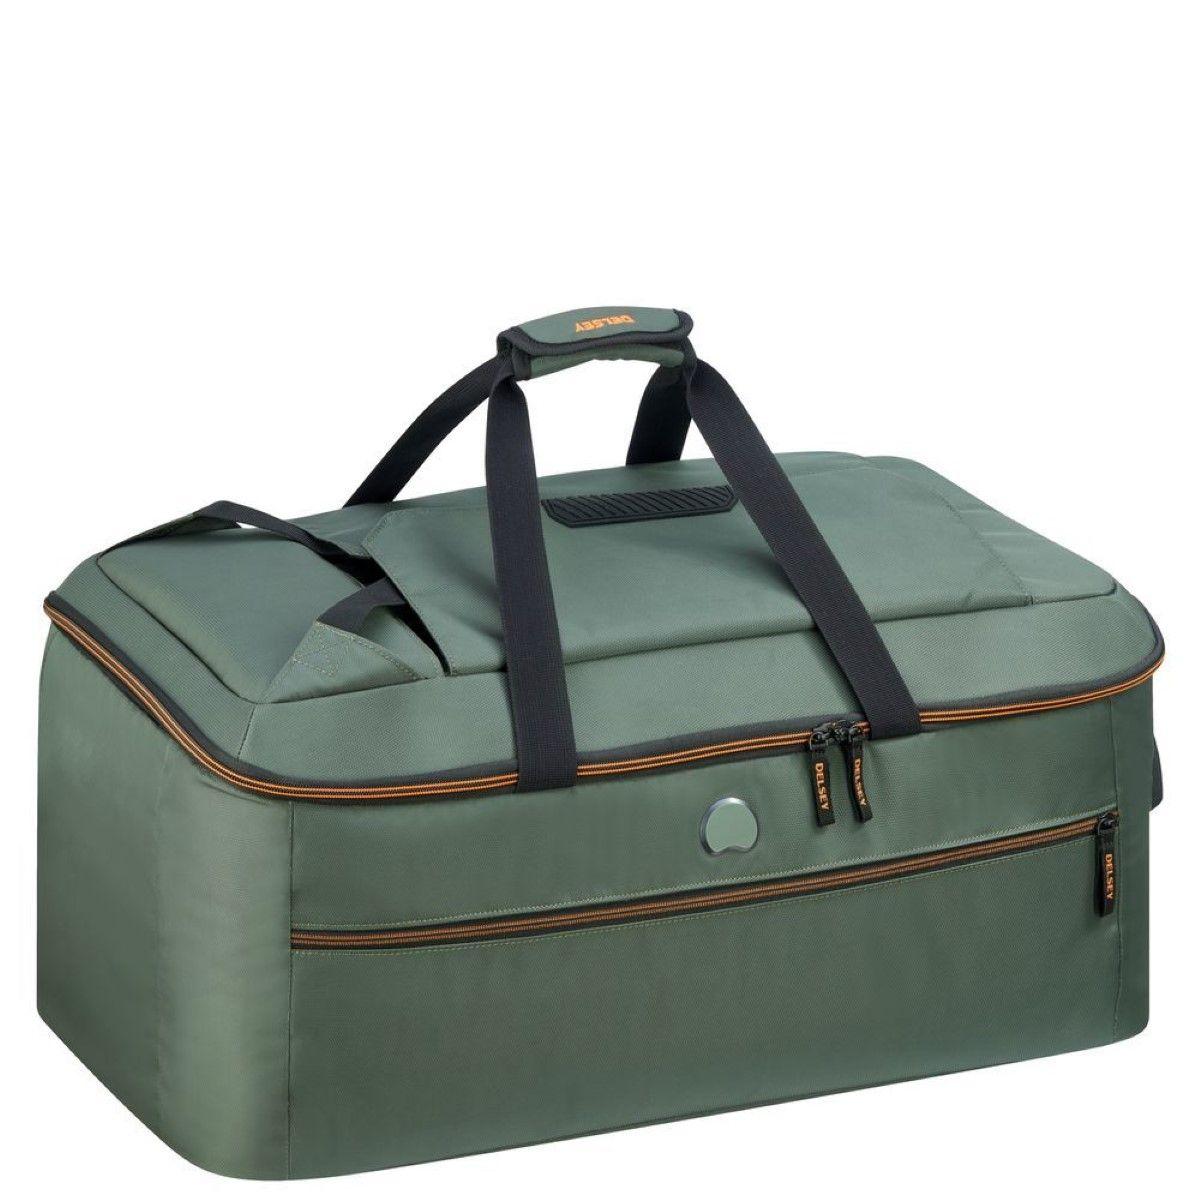 Convertible Travel Bag Tramontane 68 cm Delsey CACHI